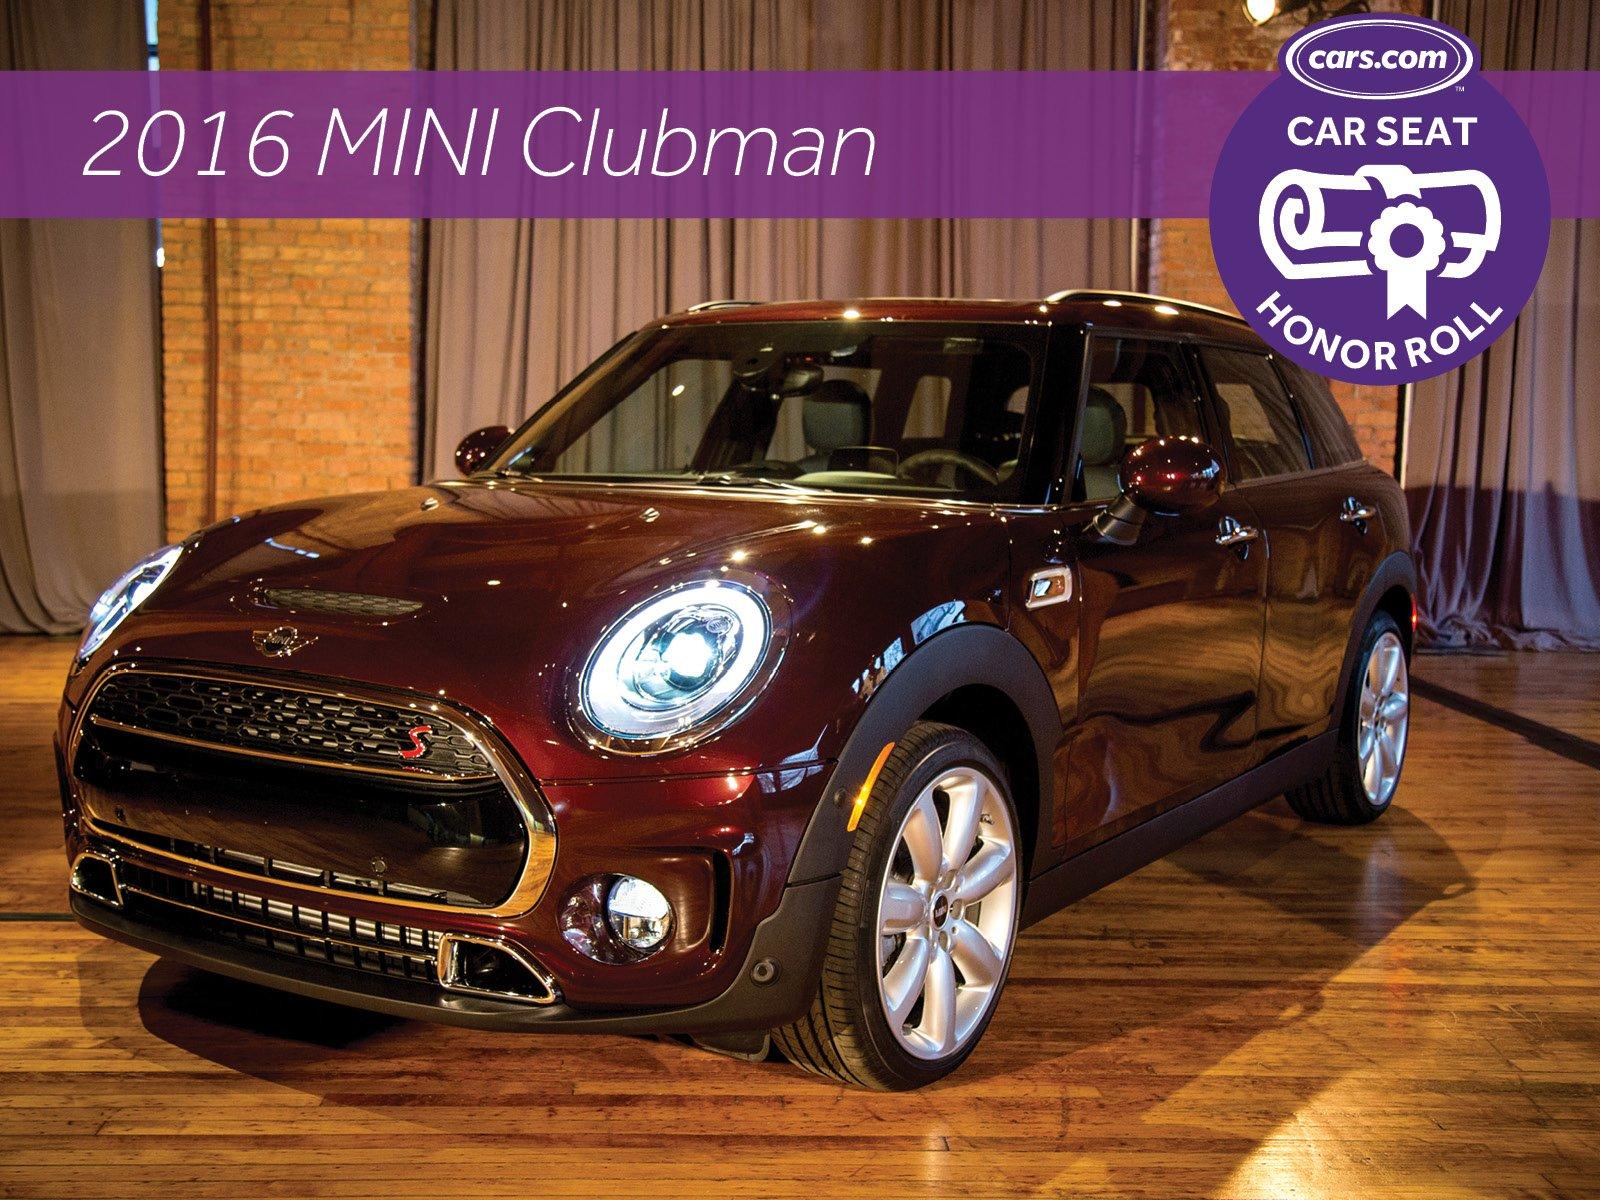 honor-roll-2016-mini-clubman1